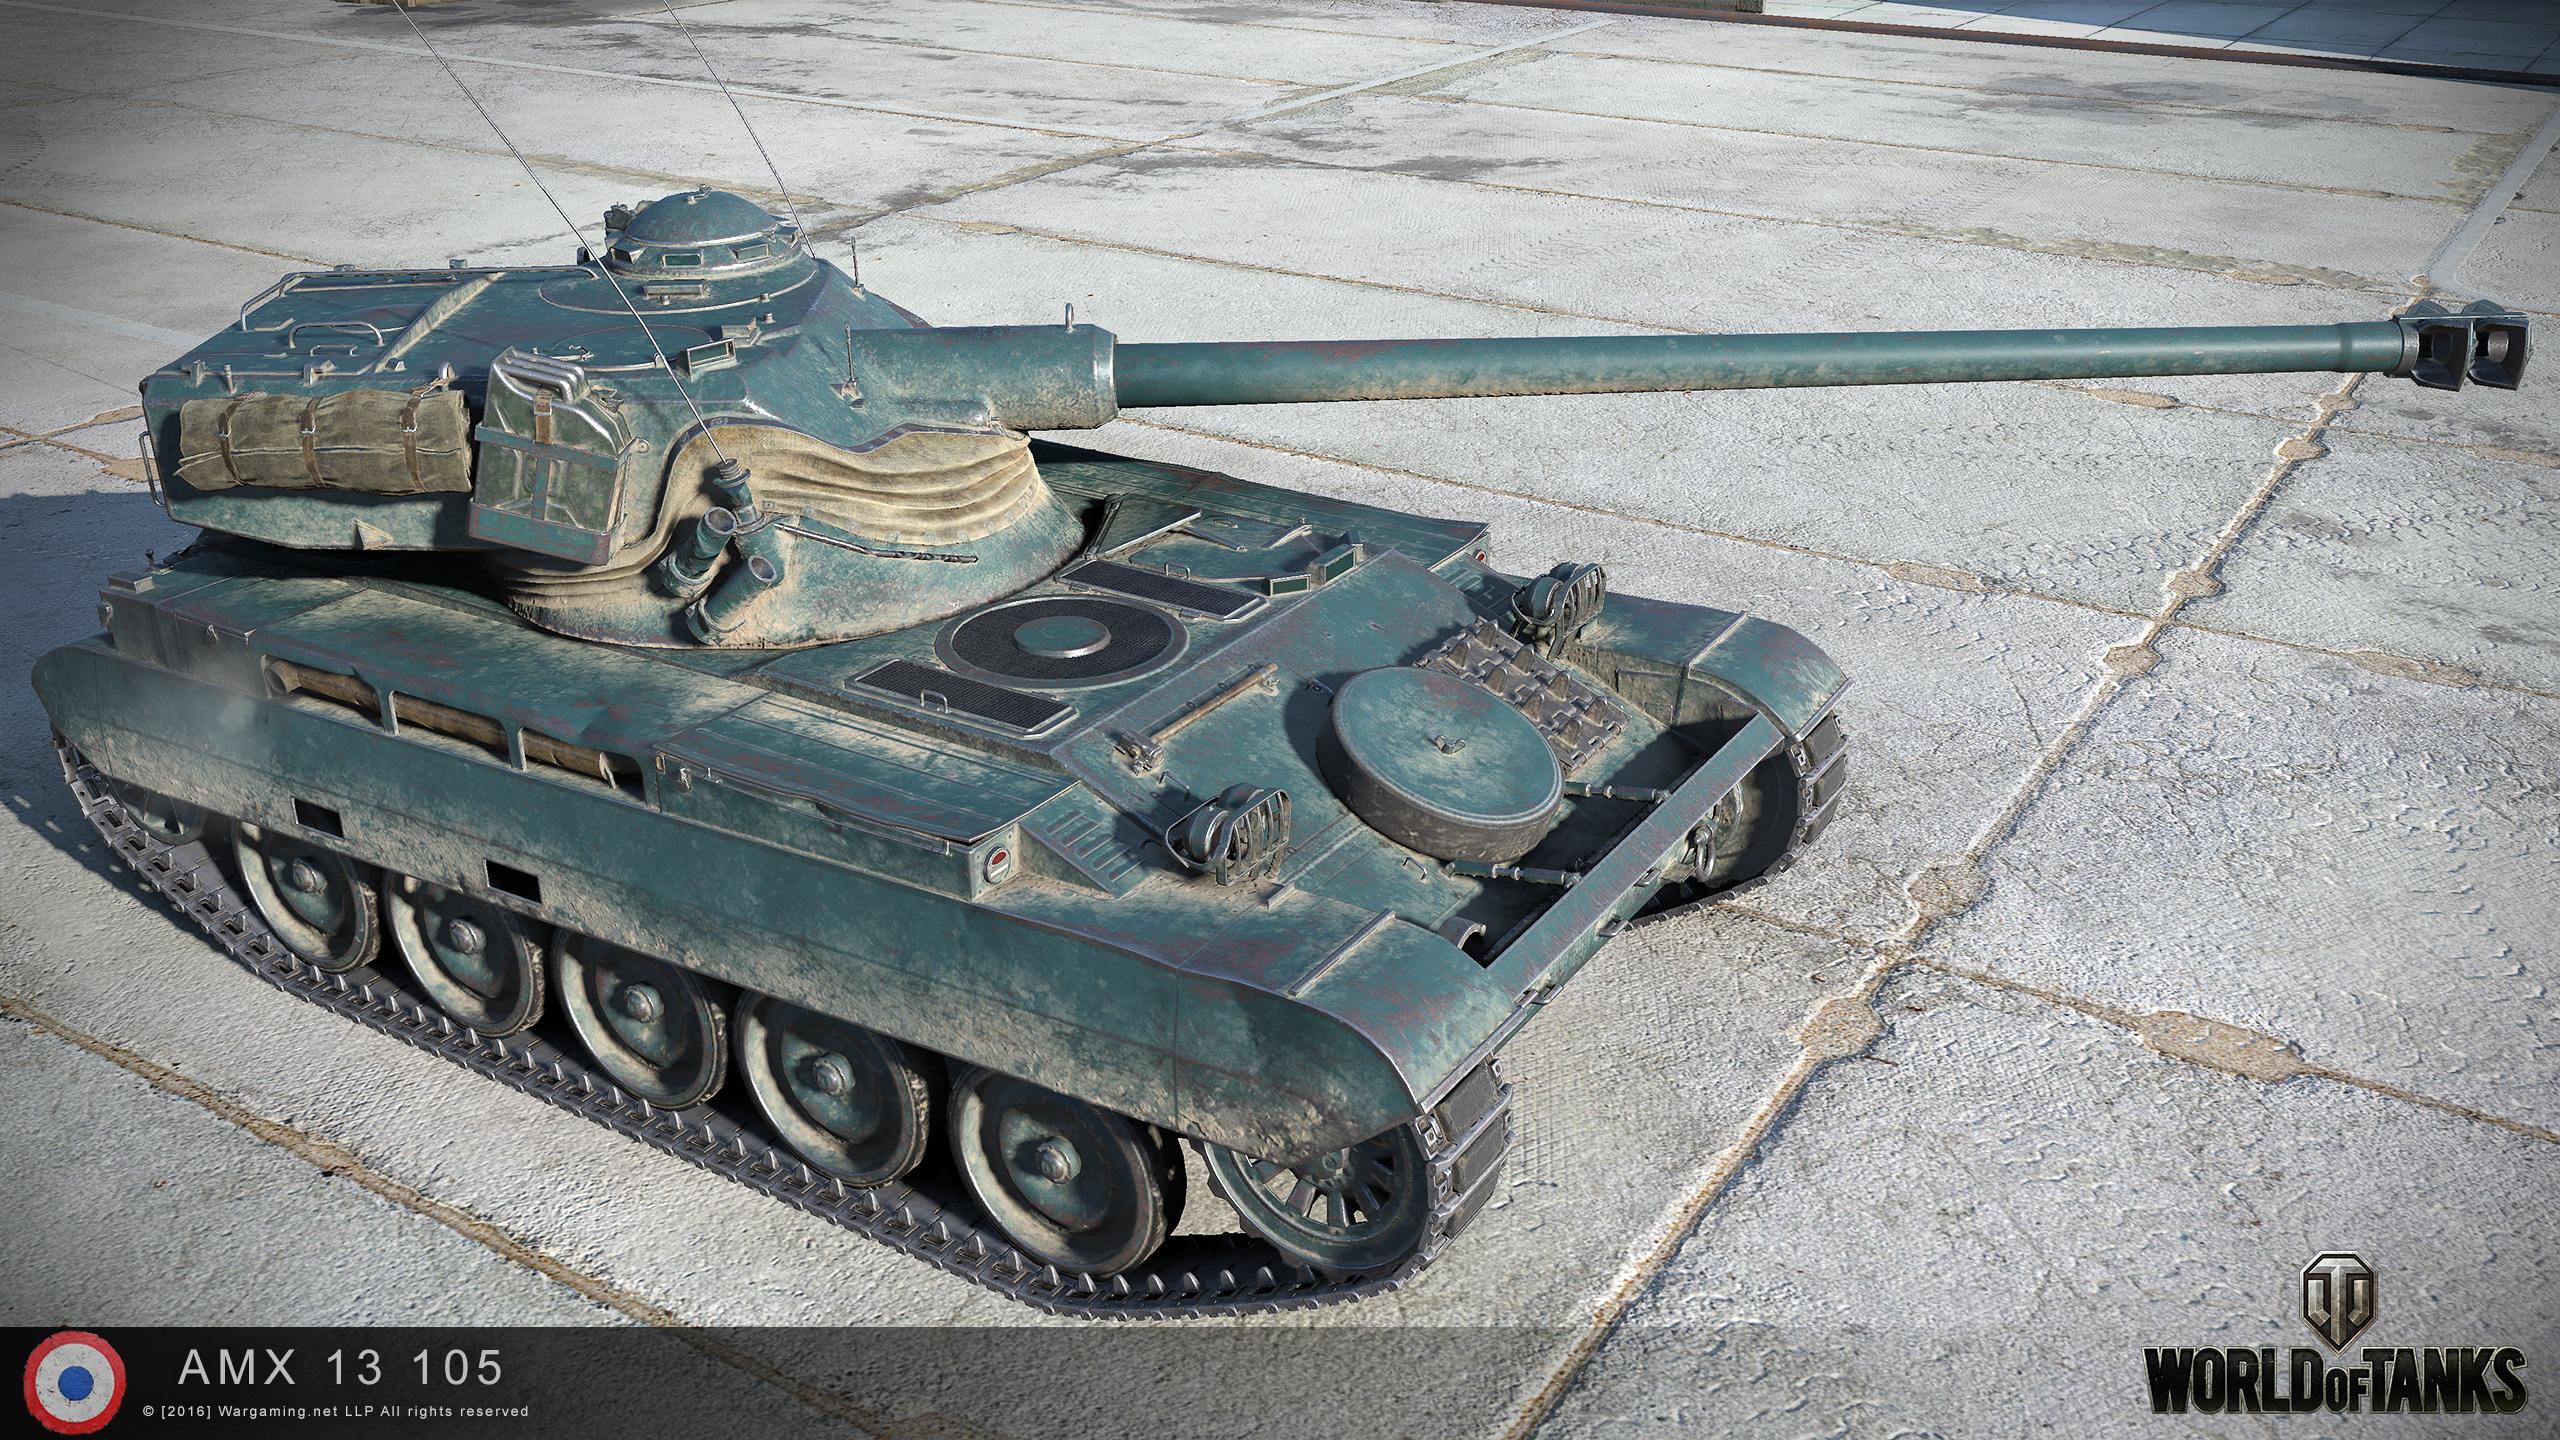 AMX 38 matchmaking